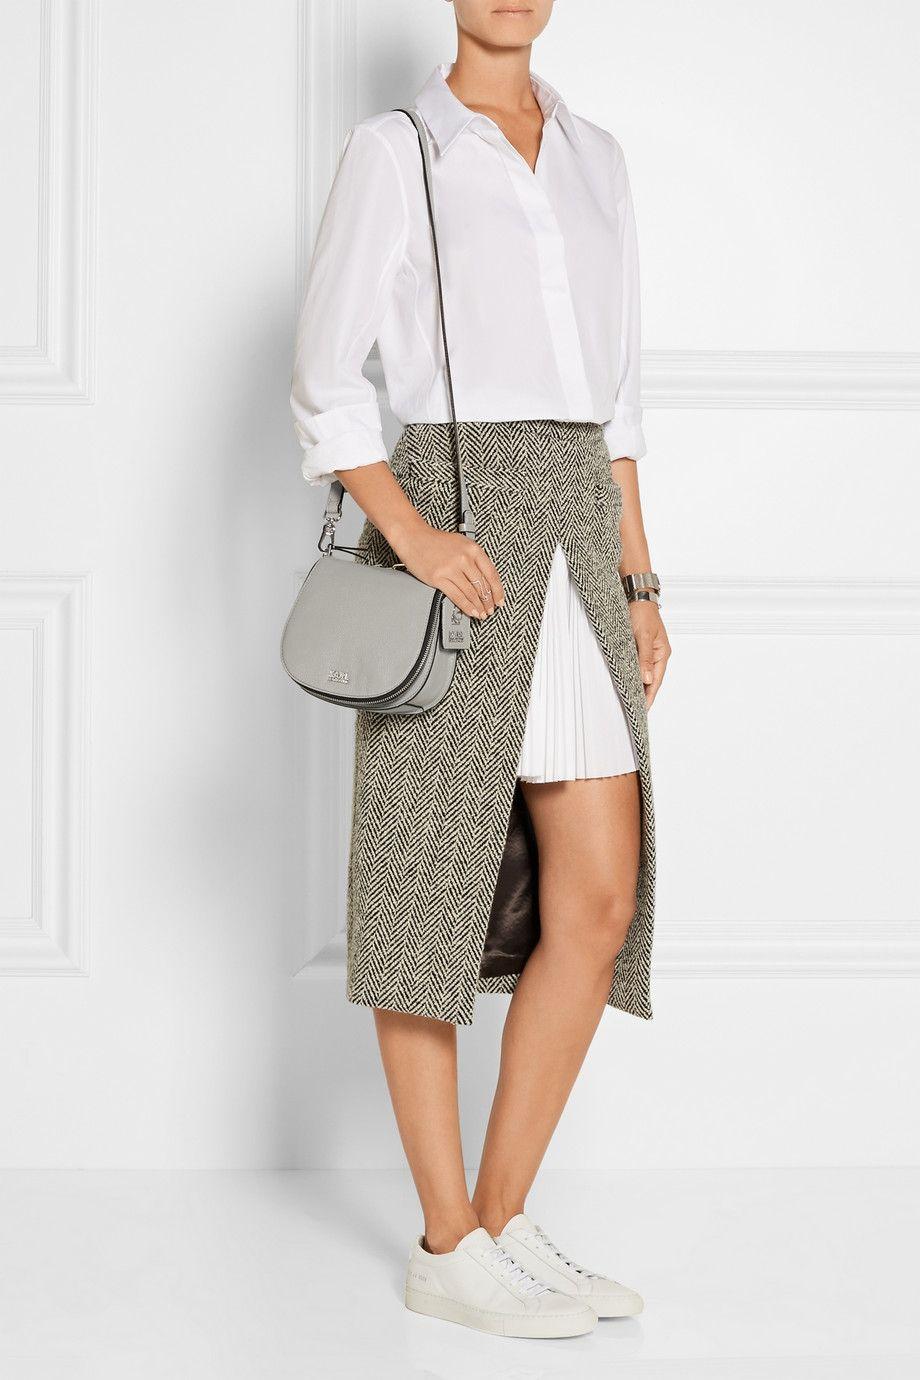 Karl Lagerfeld|Textured-leather satchel|NET-A-PORTER.COM